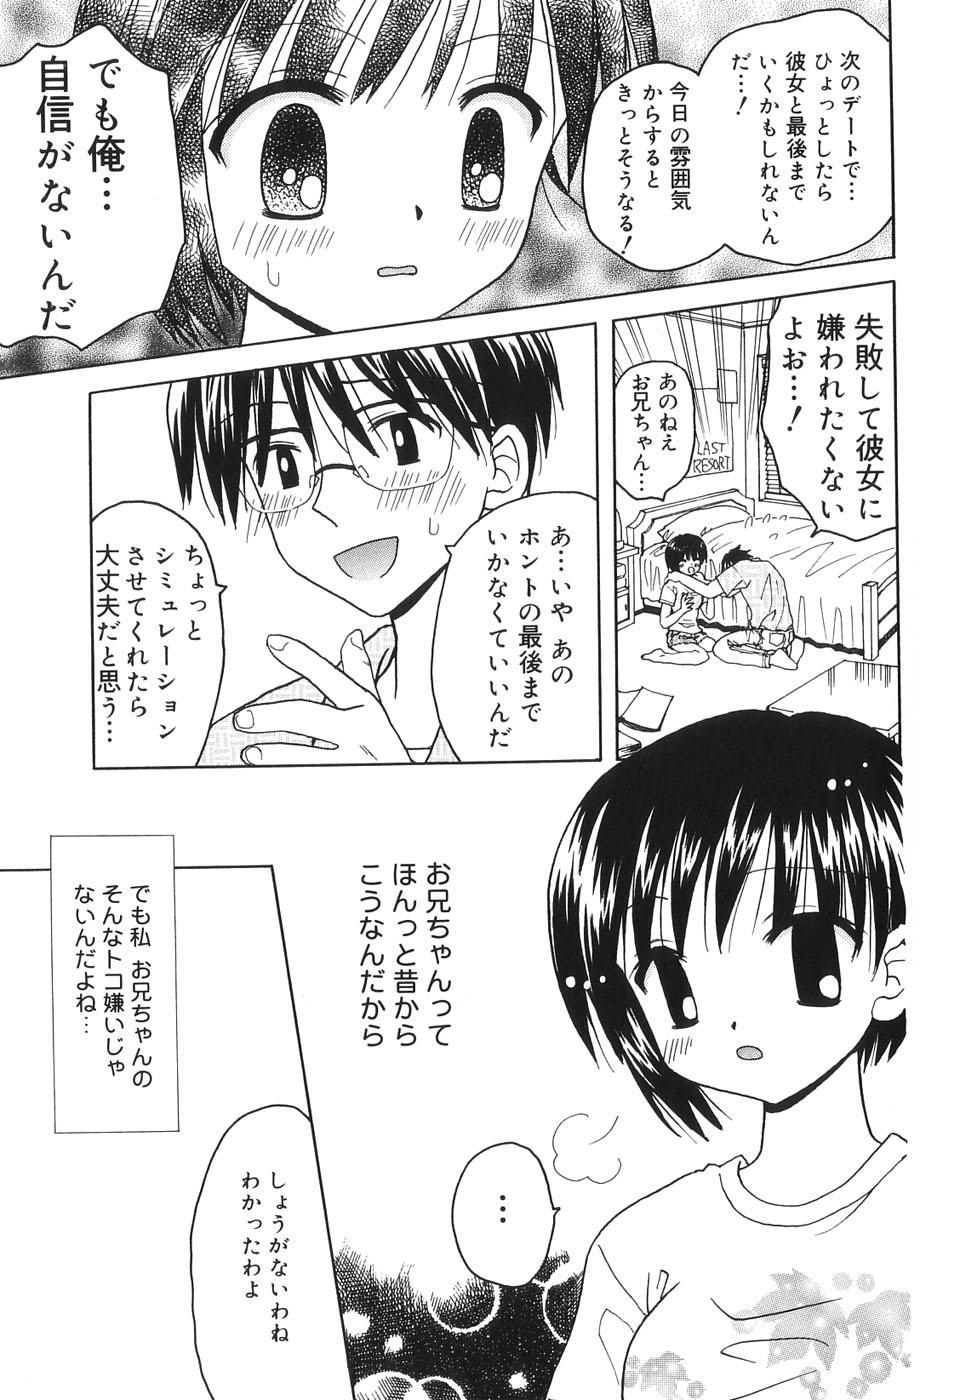 Musoubana 111